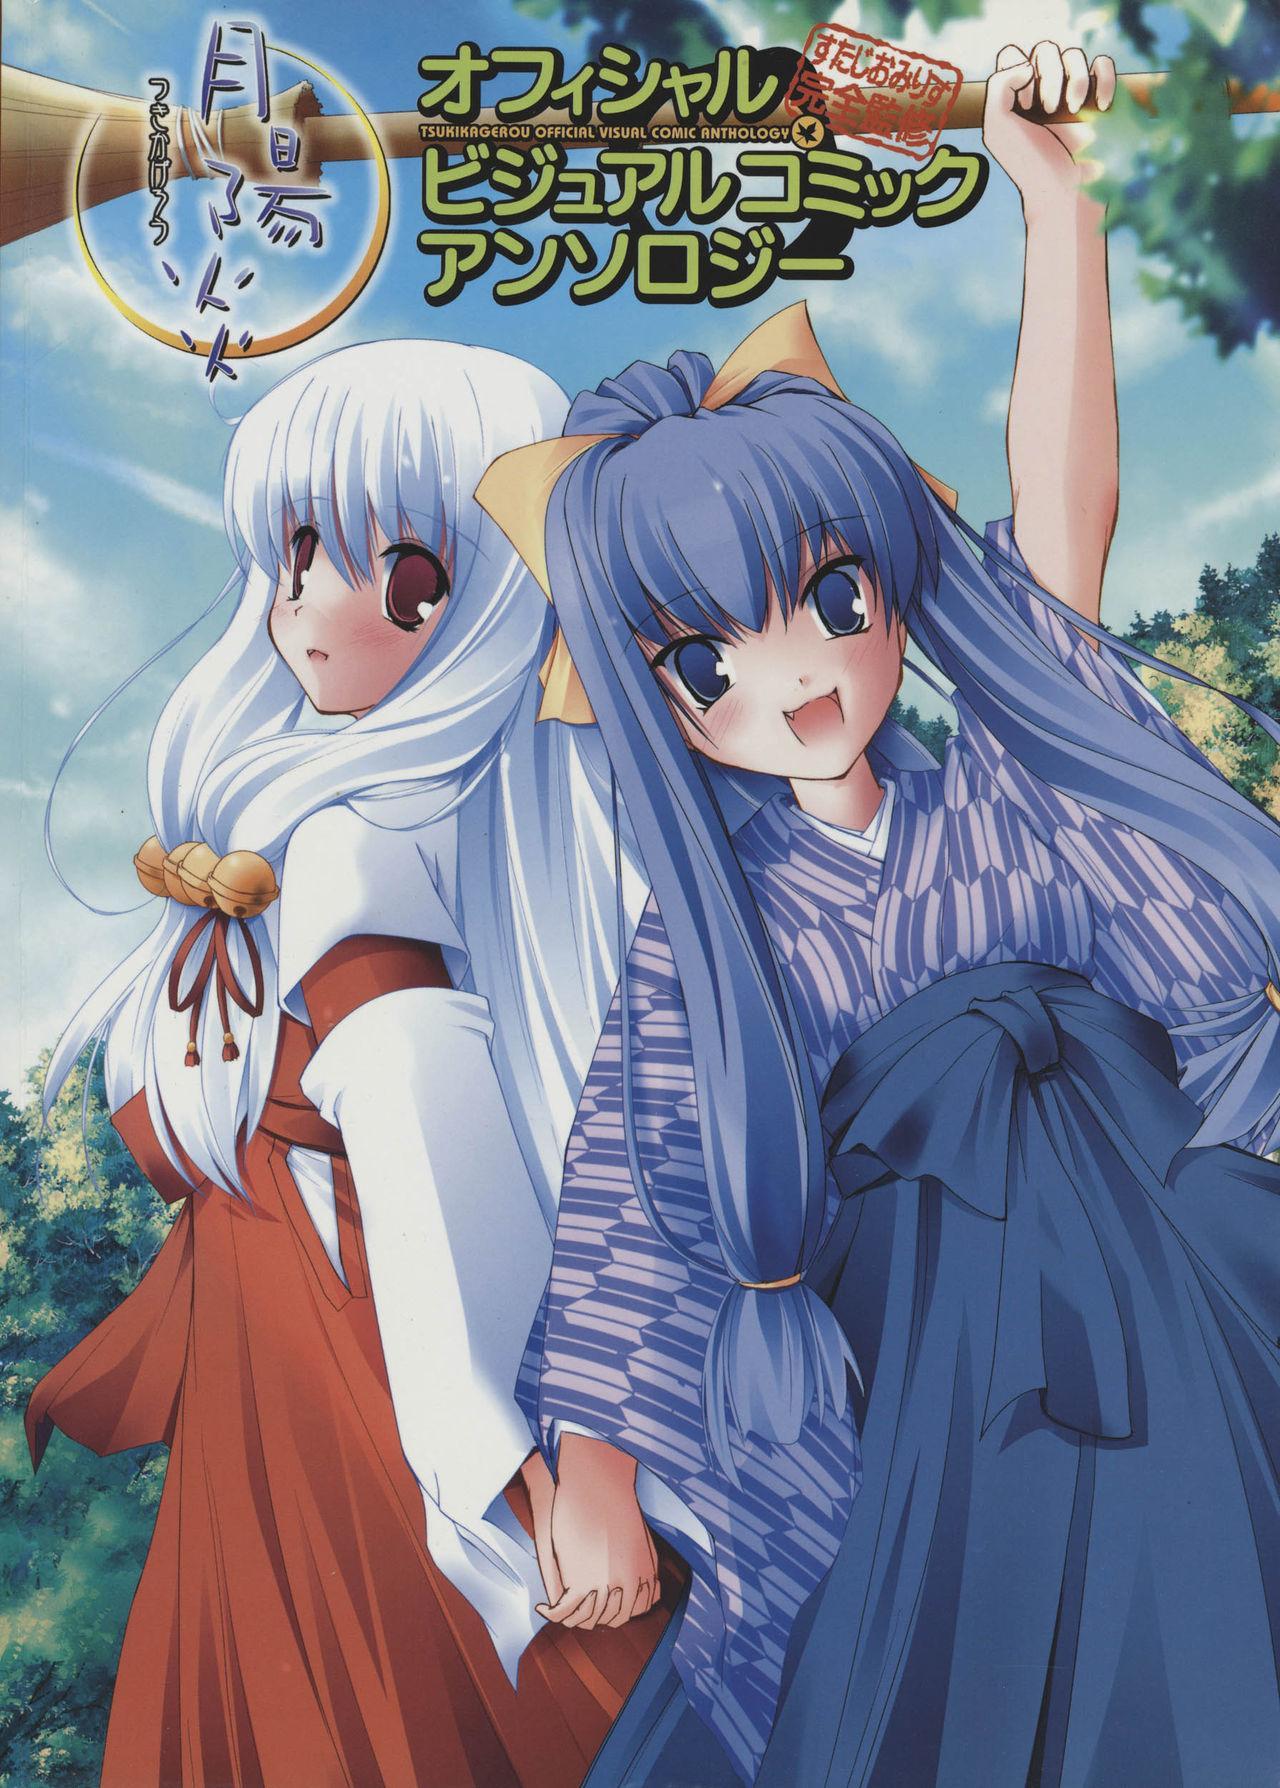 Tsukikagerou Official Visual Comic Anthology 0